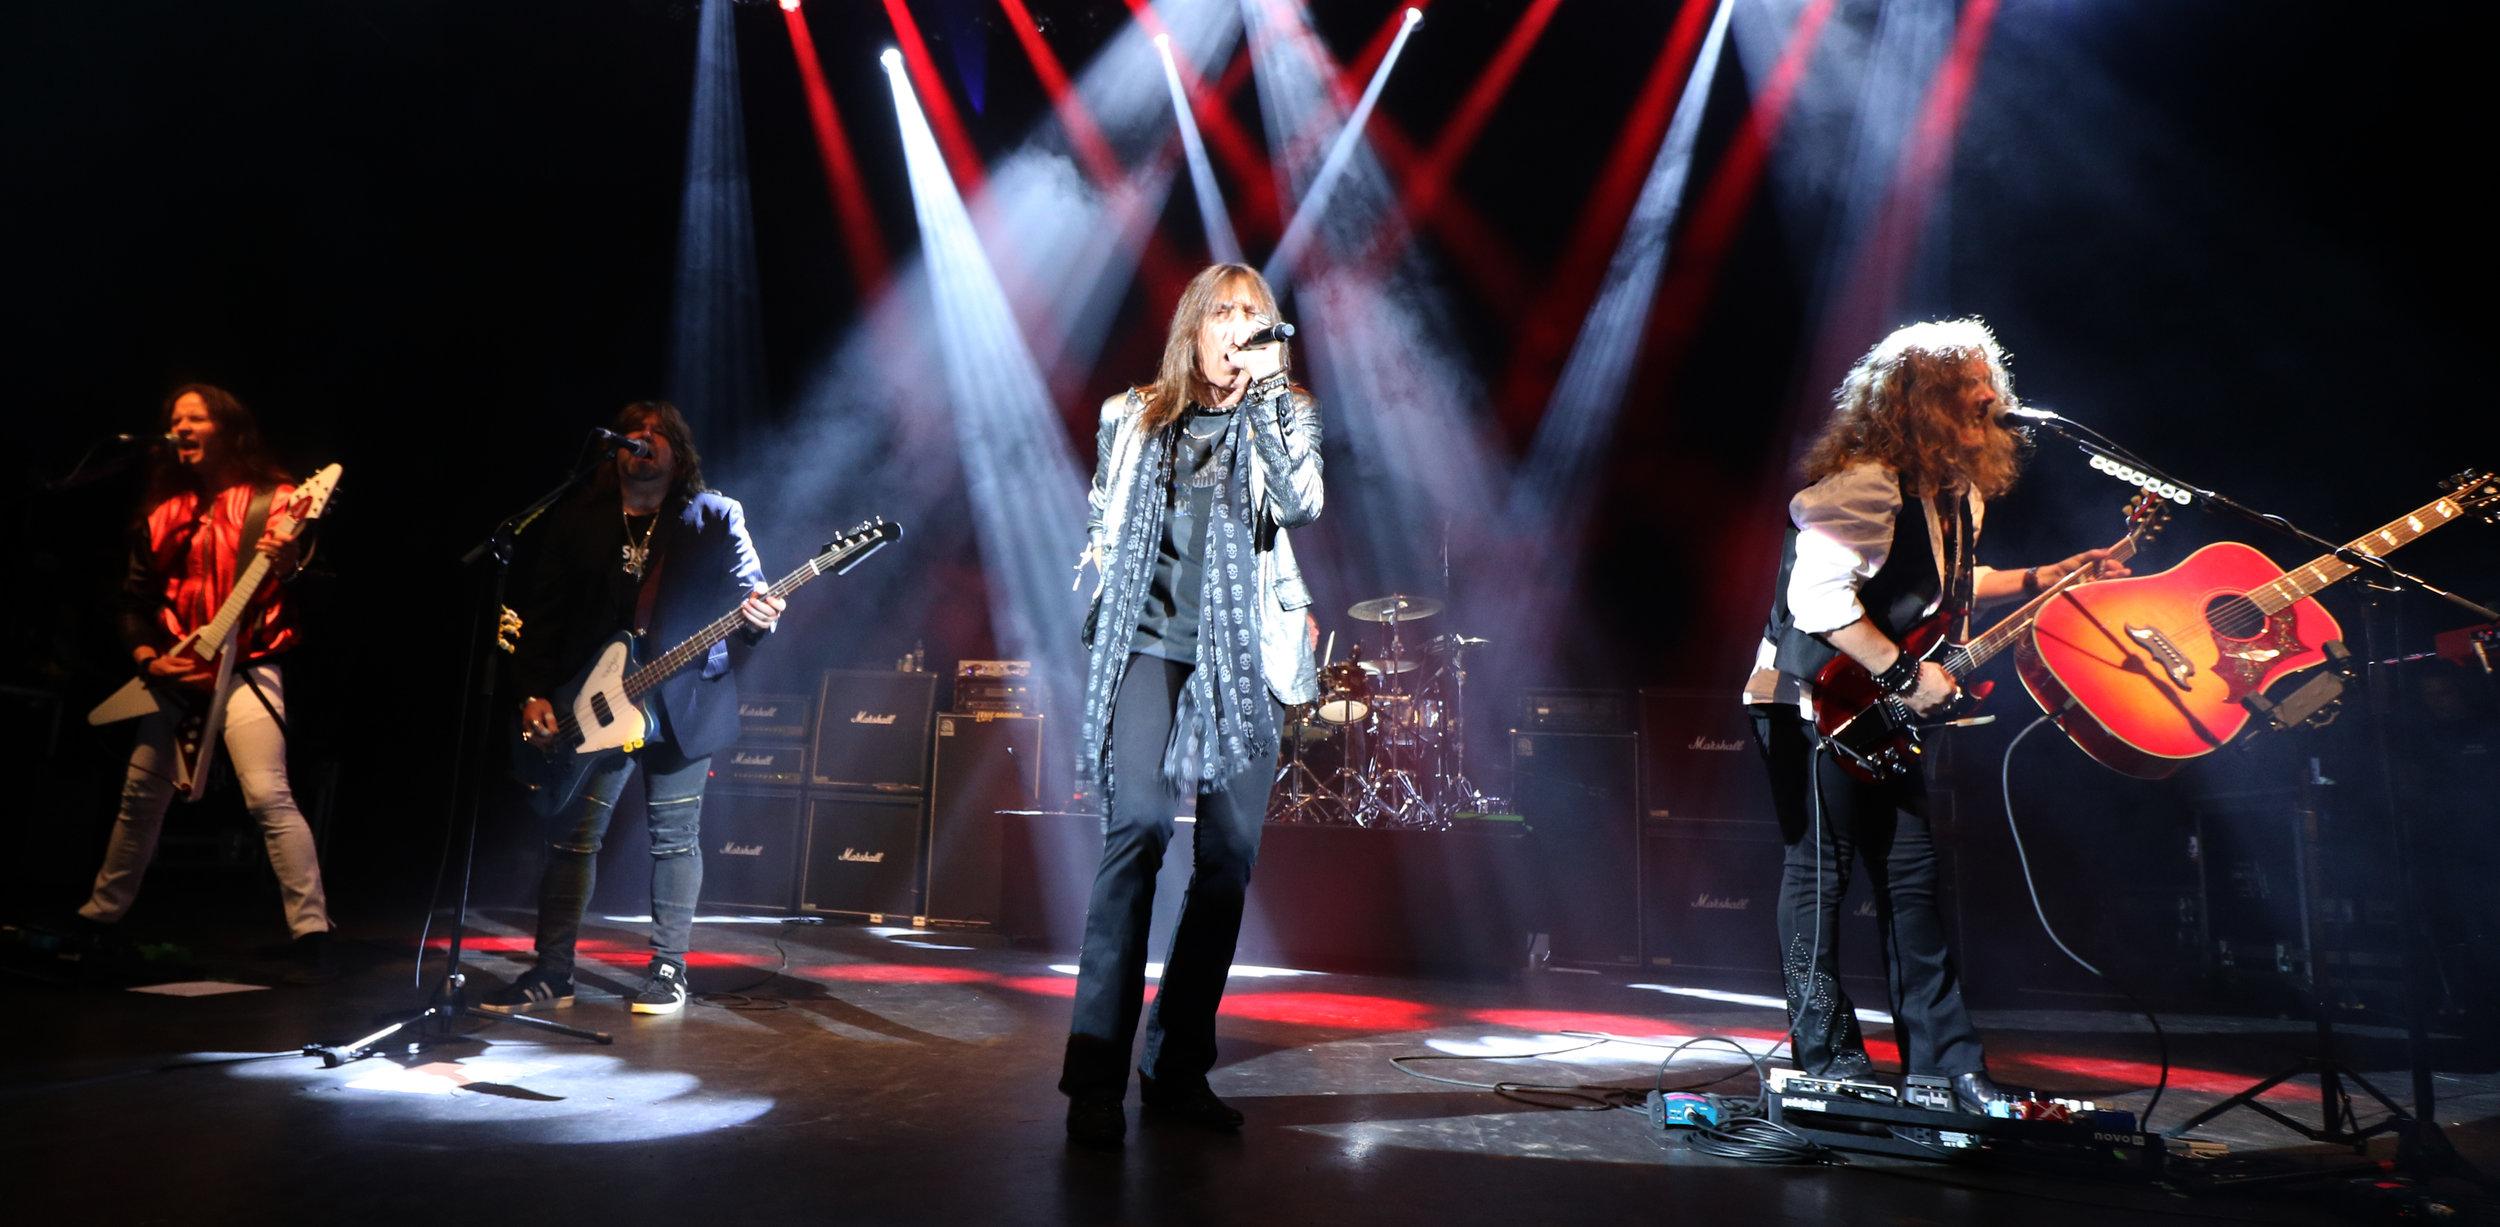 Telsa in their Hard Rock might. Source: Ksana Bartlett